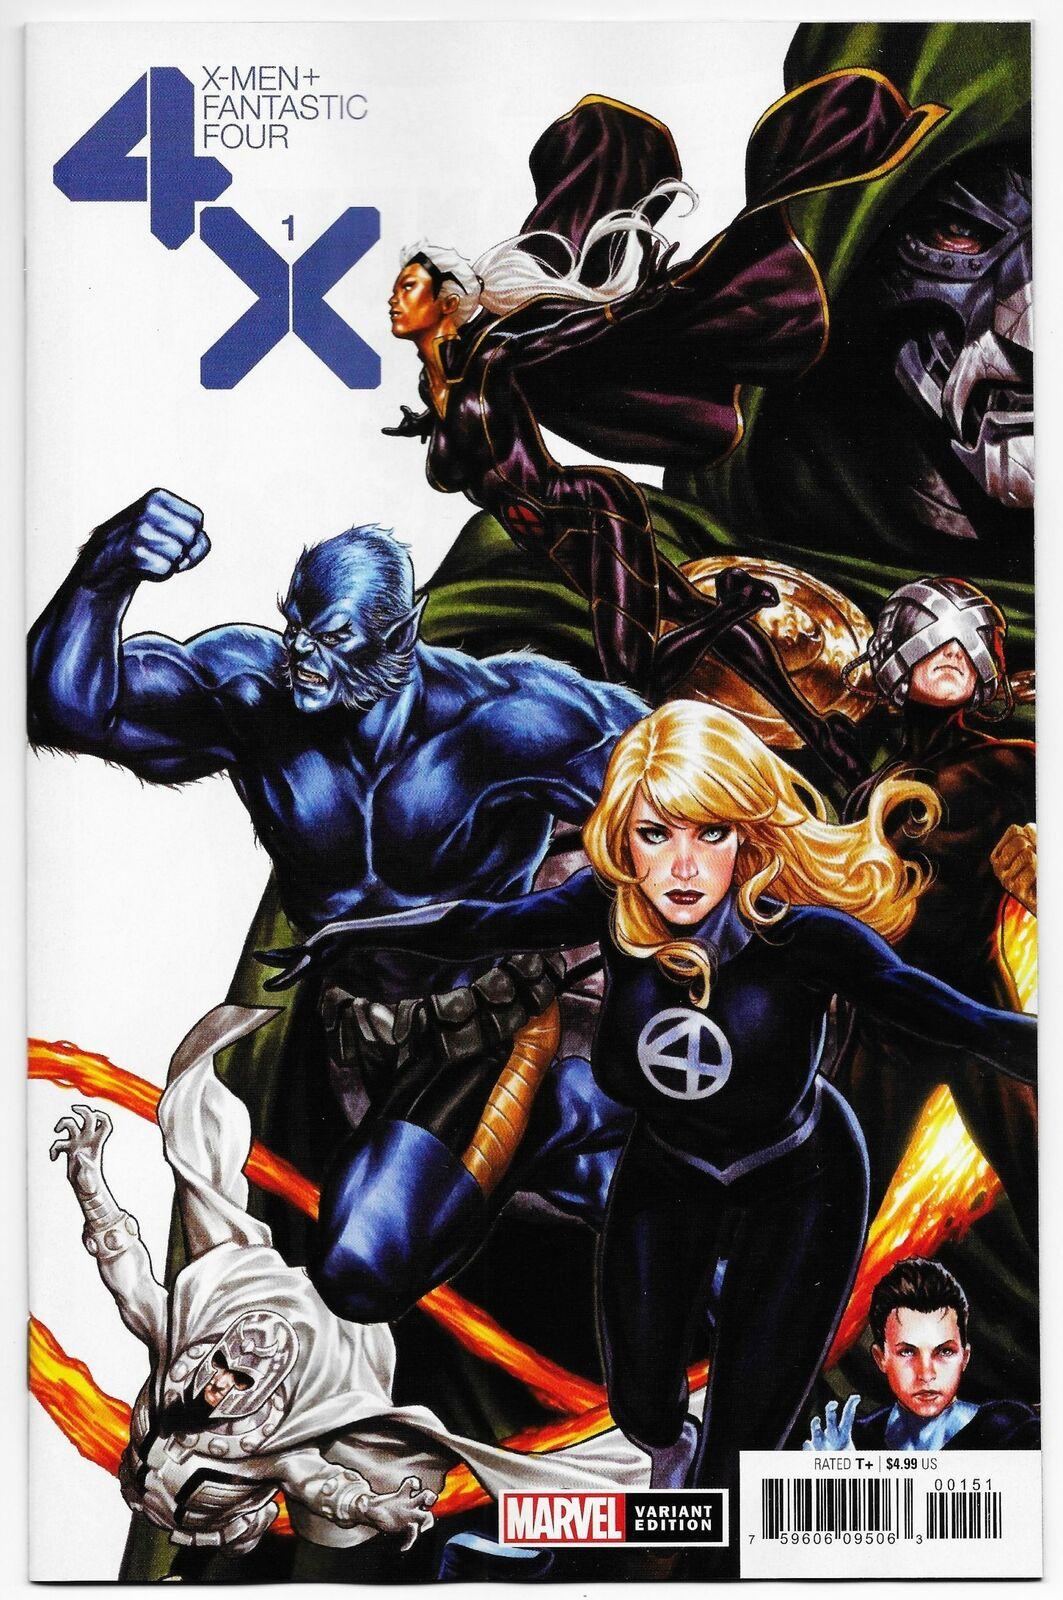 Modern Age (1992-Now) NM The Punisher #1 Fantastic Four Variant Marvel,  2018 emojiplay.vn